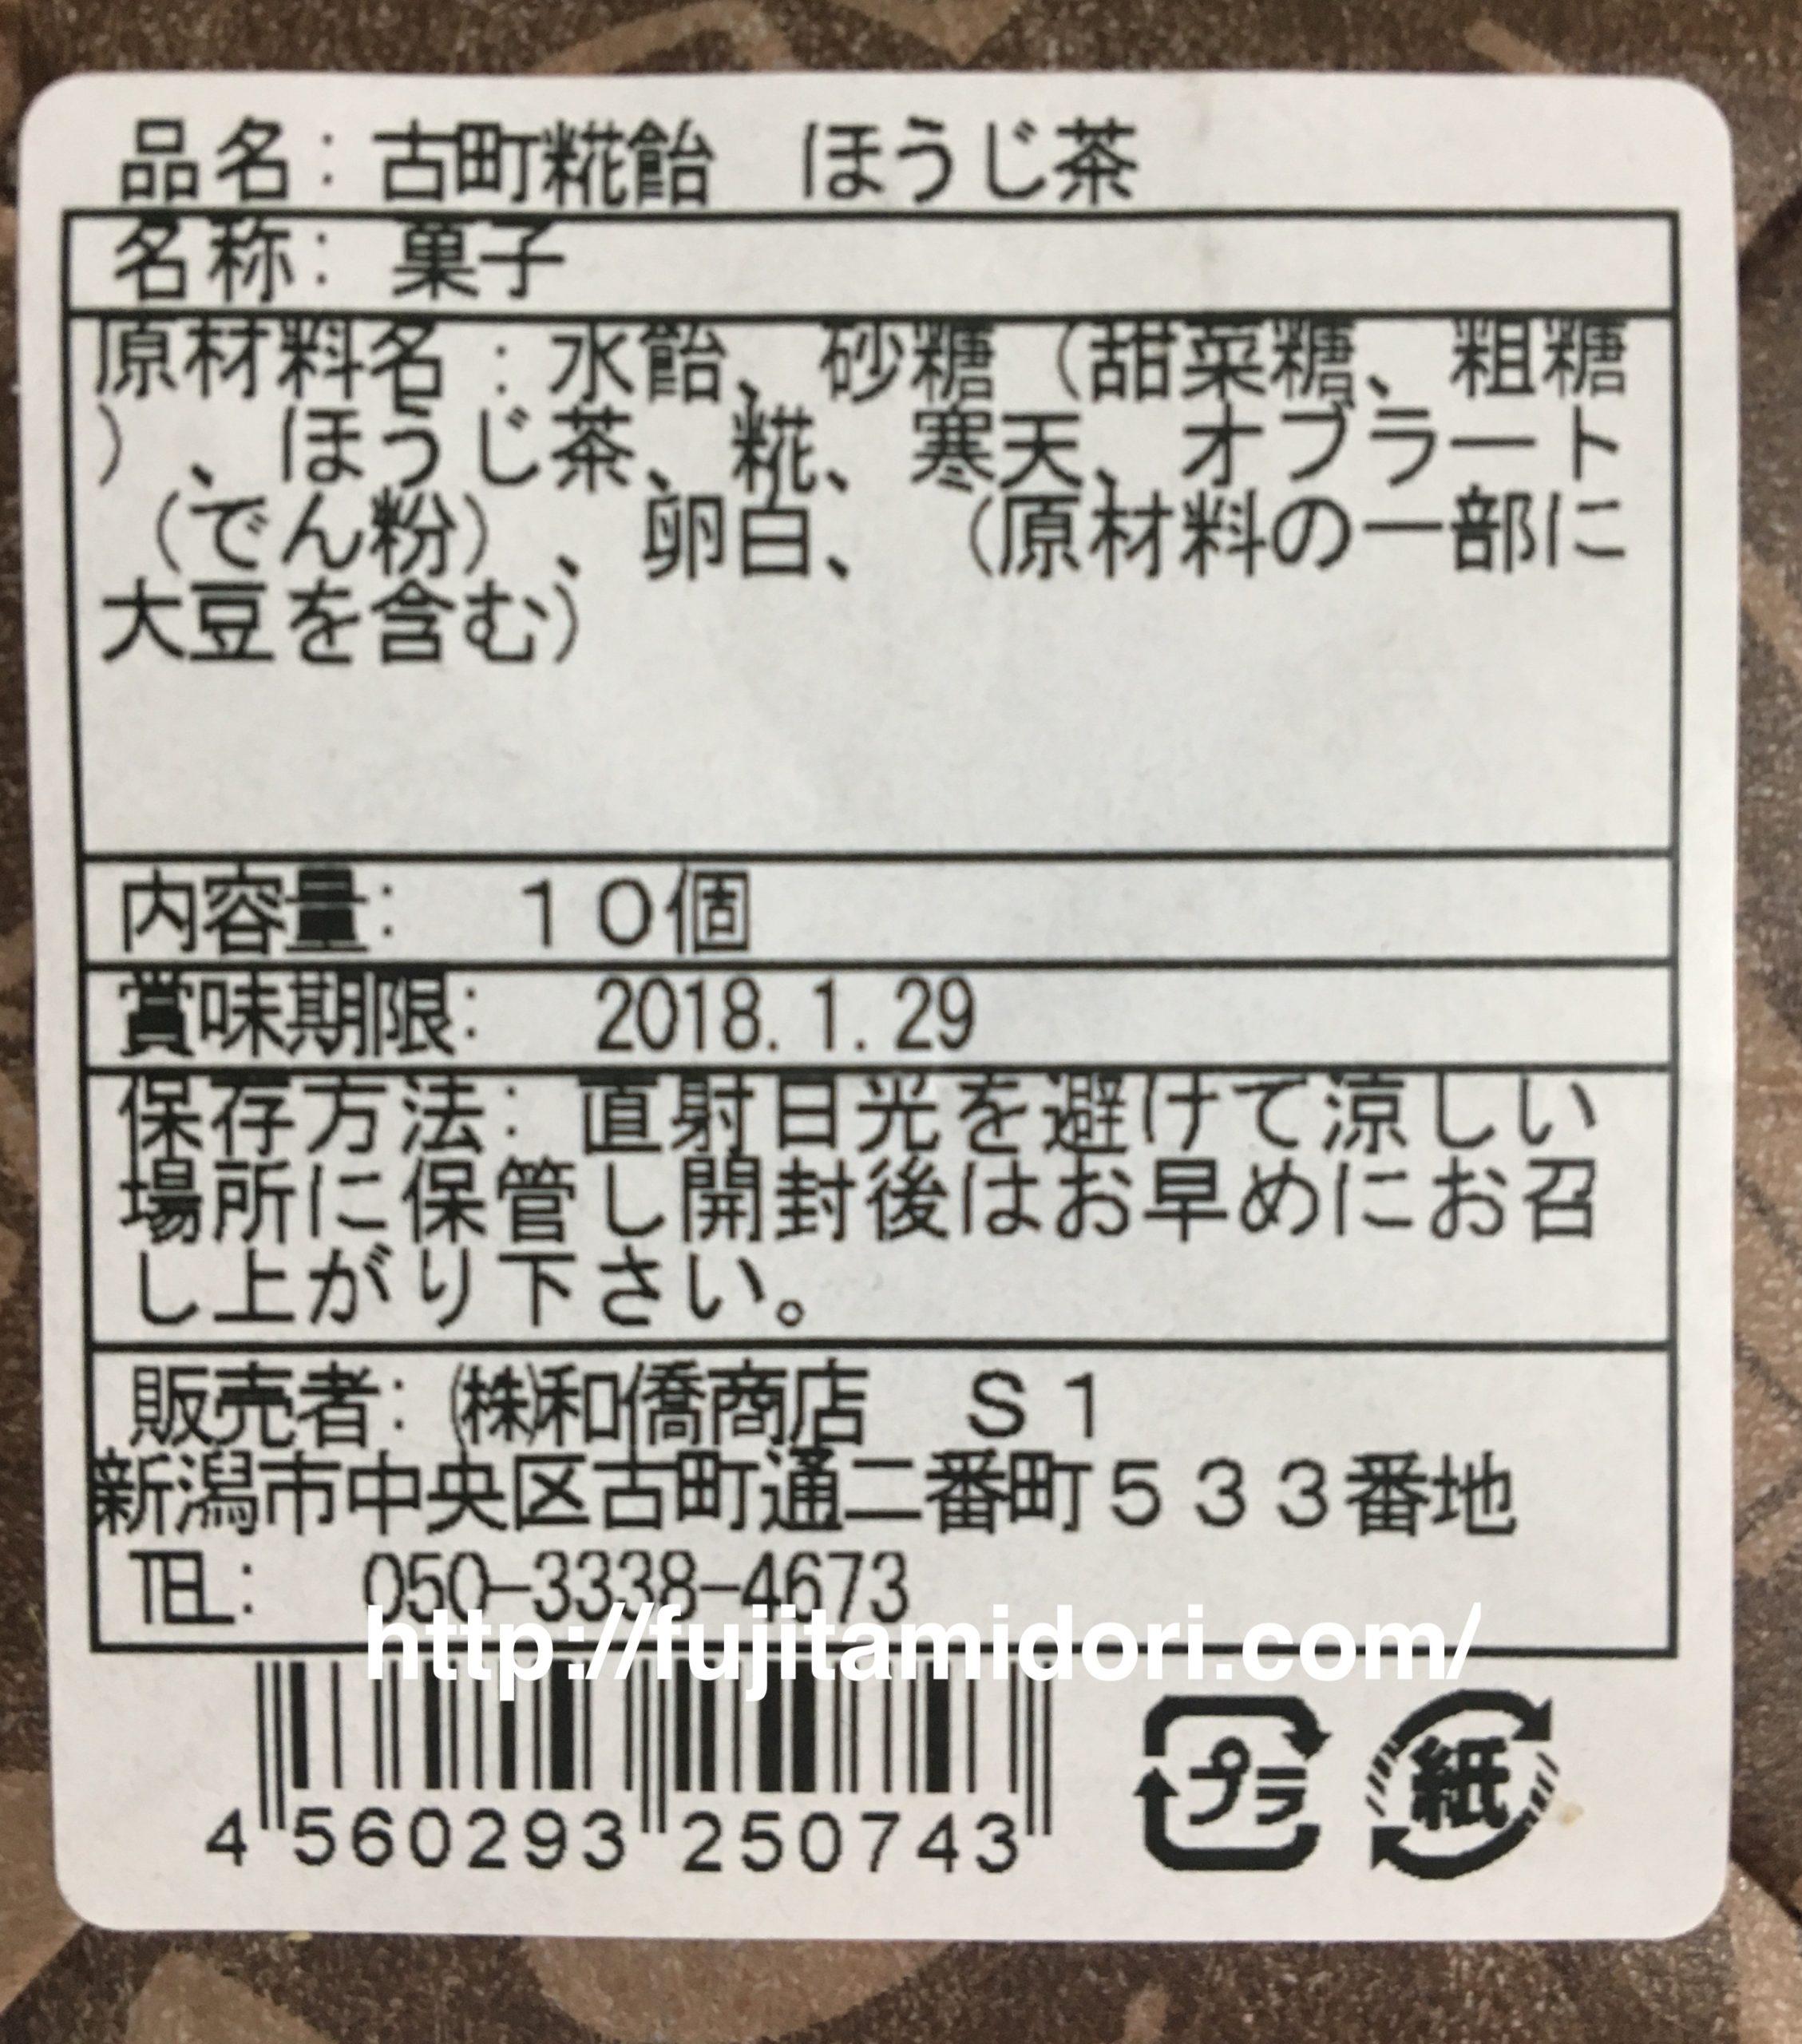 【甘酒甘味】古町糀製造所『古町糀飴(ほうじ茶)』(商品情報)